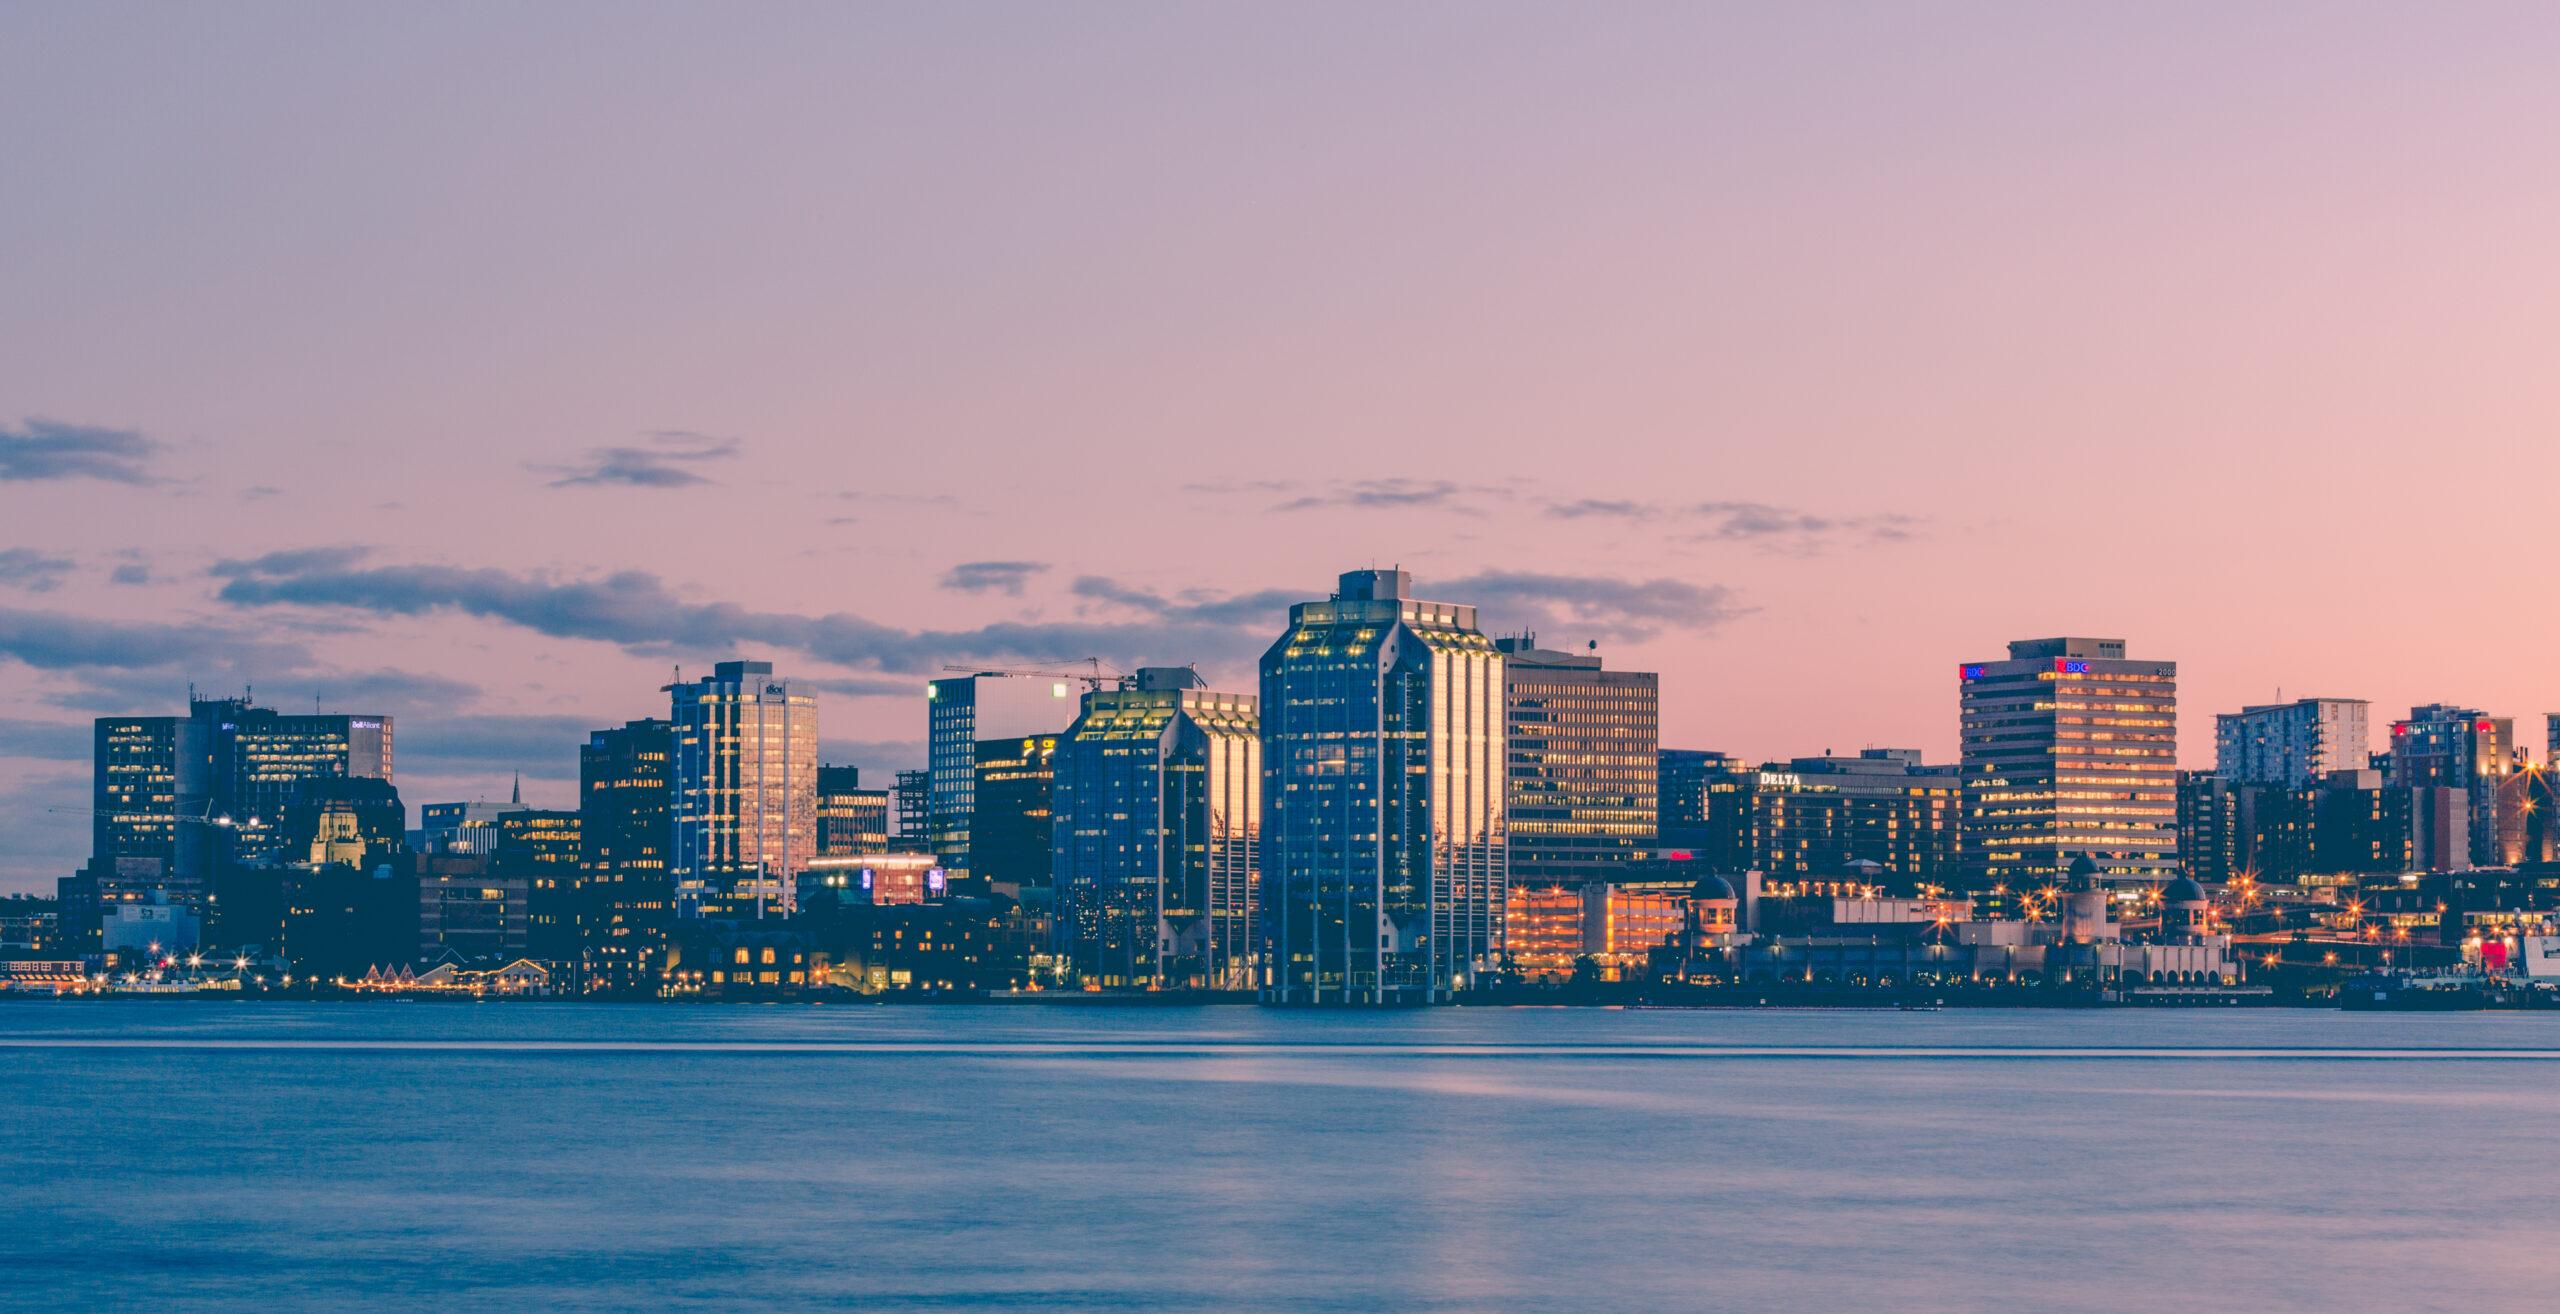 Government of Nova Scotia to recruit at Jobs Expo Dublin